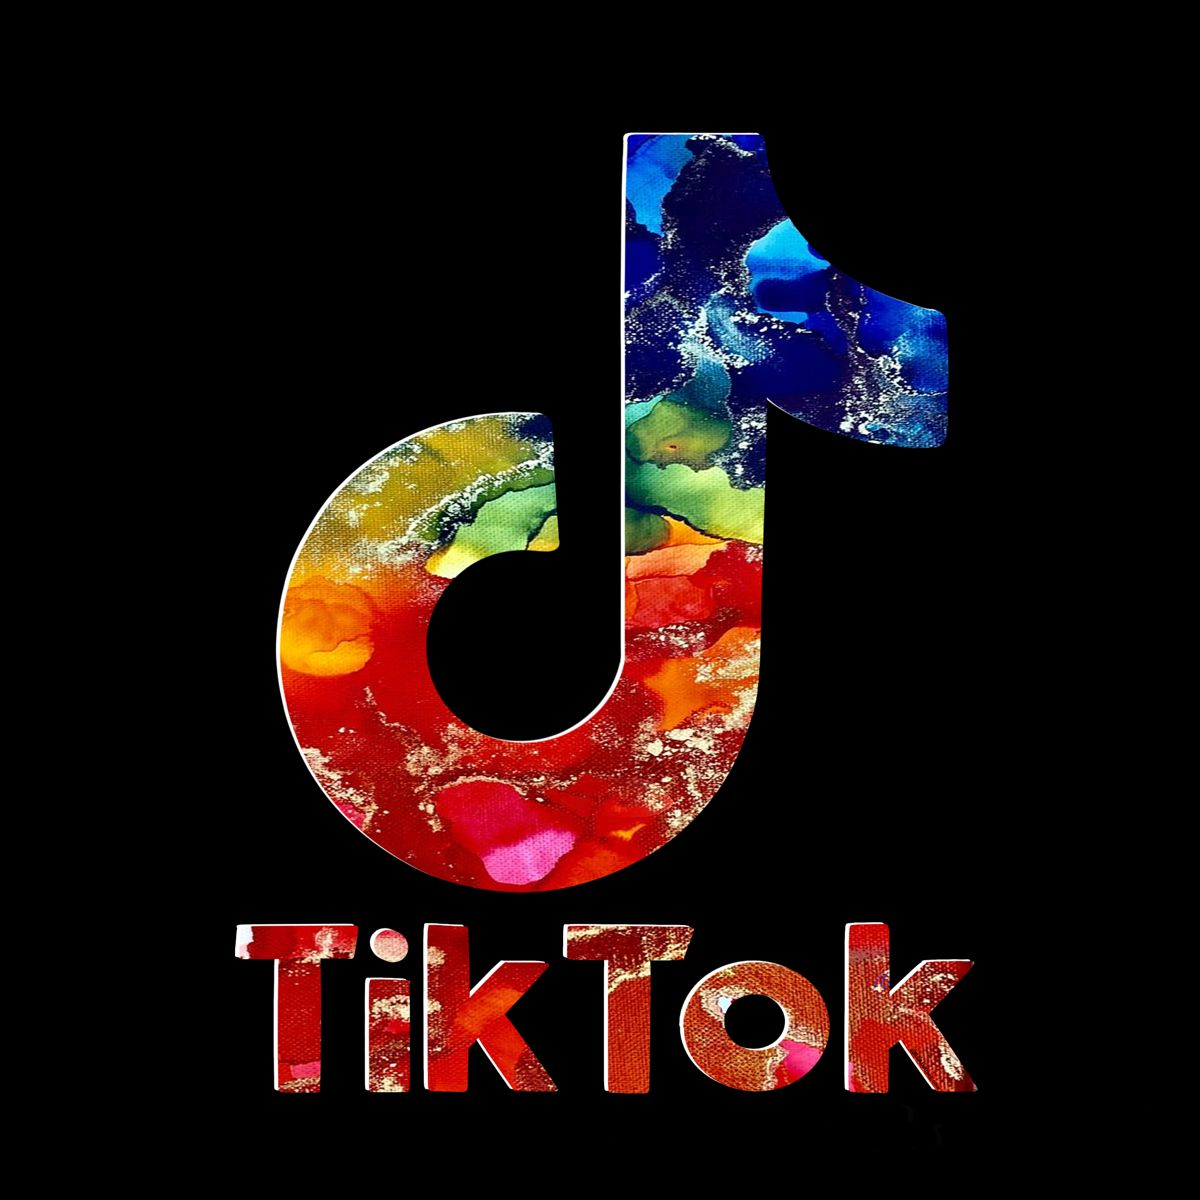 Rainbow And Gold Tik Tok Logo With Ink Wallpaper Iphone Neon Cute Galaxy Wallpaper Art Logo